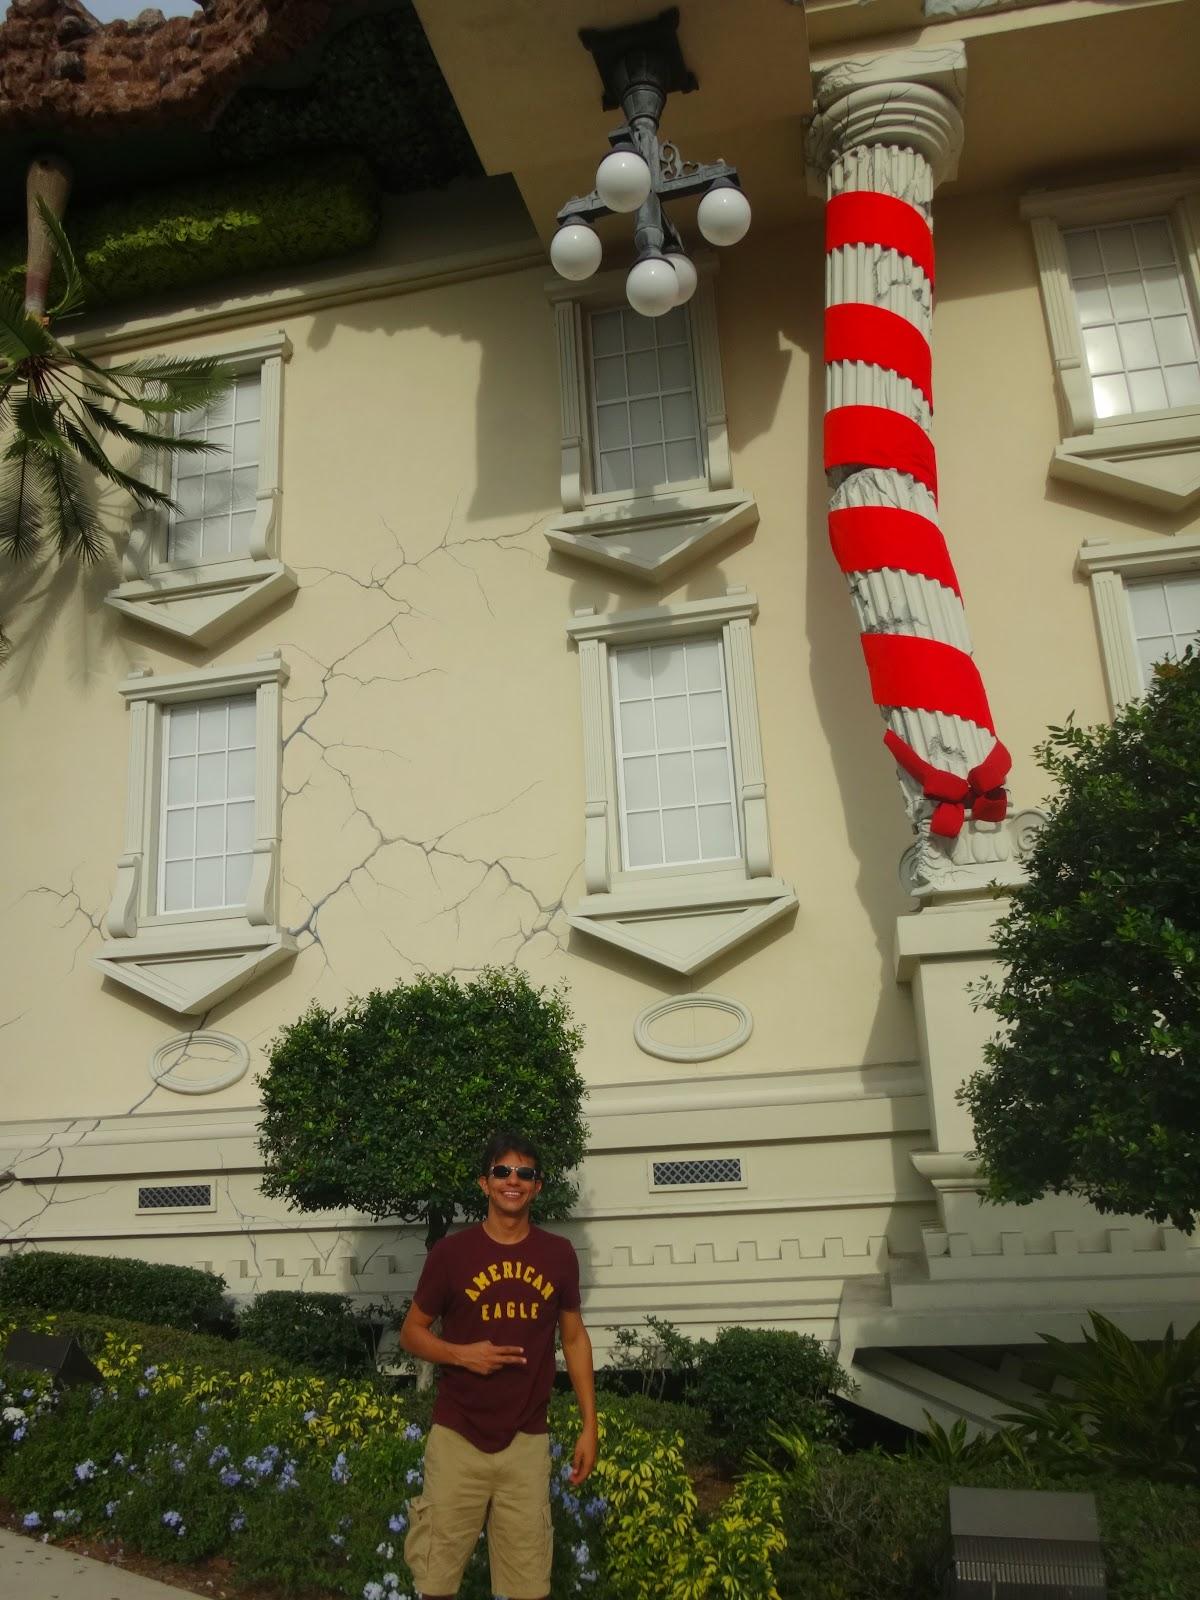 wonderworks - casa invertida - orlando, florida